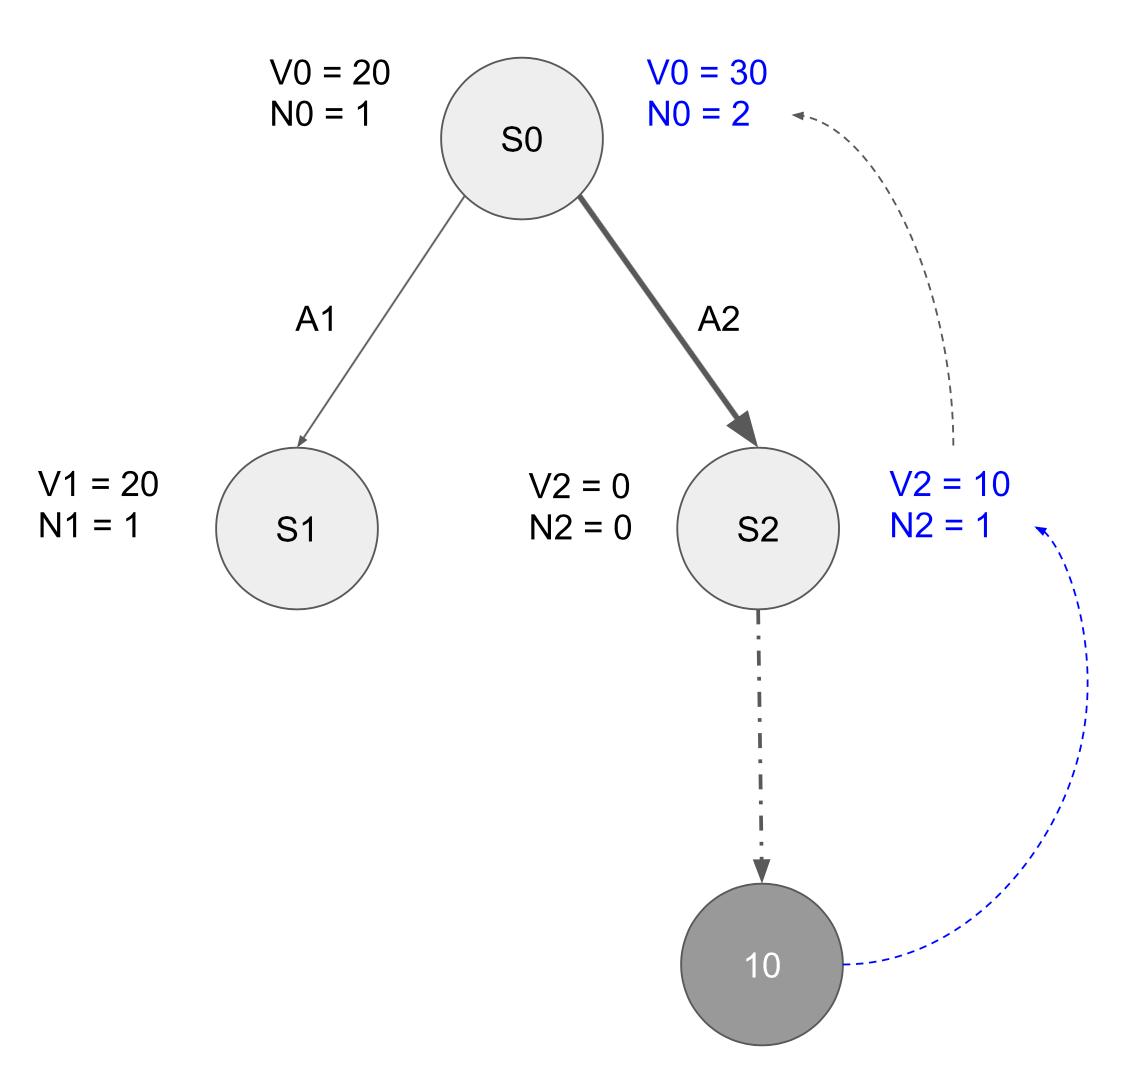 Monte Carlo Tree Search In Reinforcement Learning